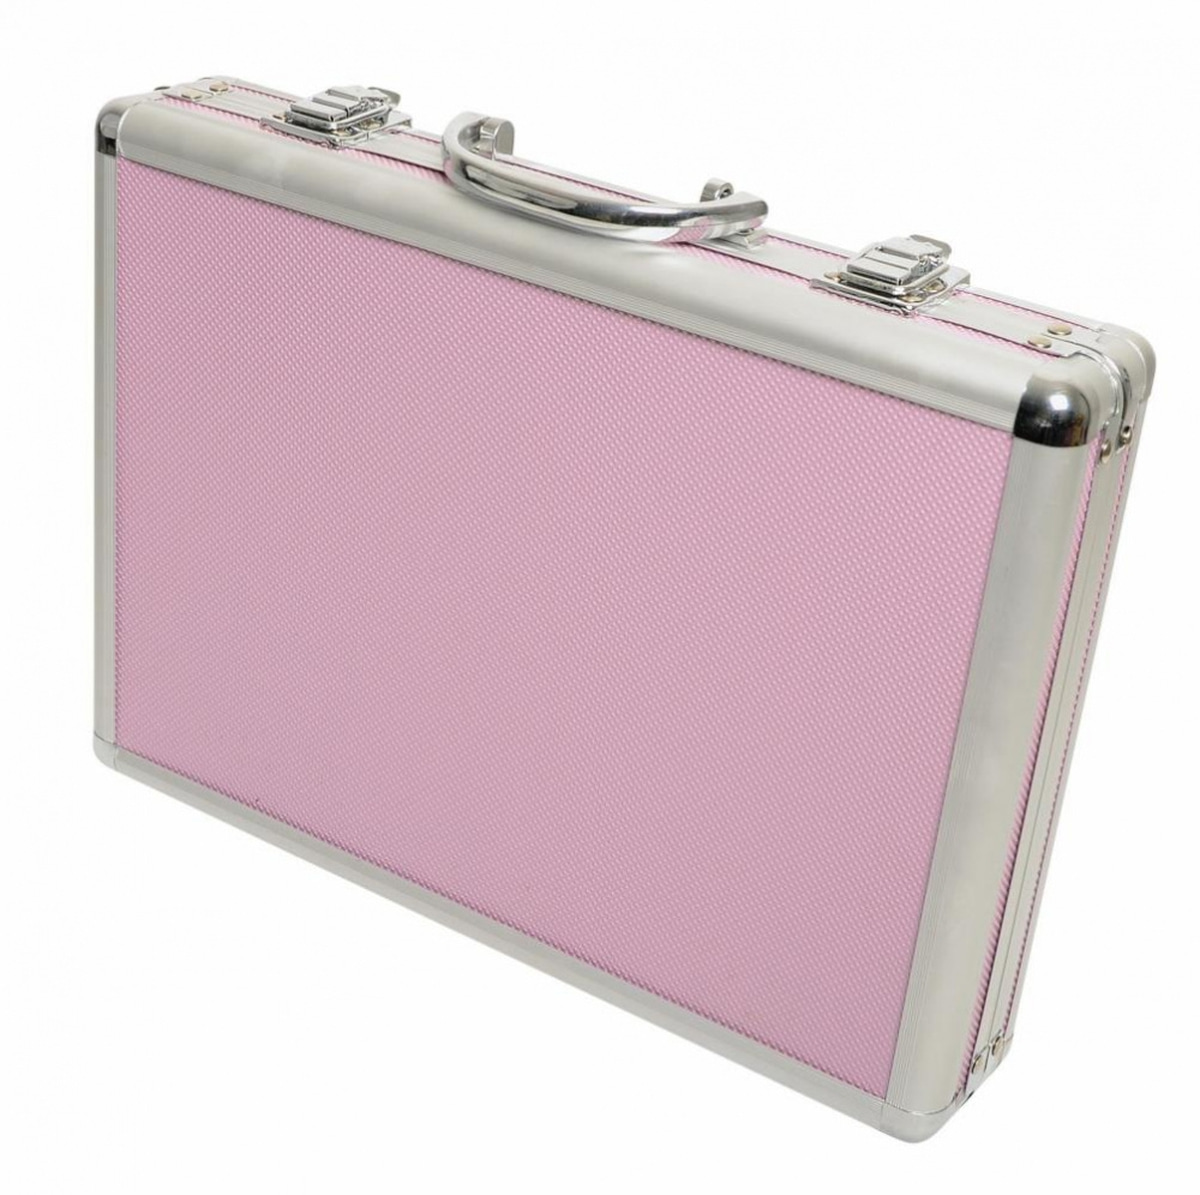 Millarco verktøysett rosa - 14 deler